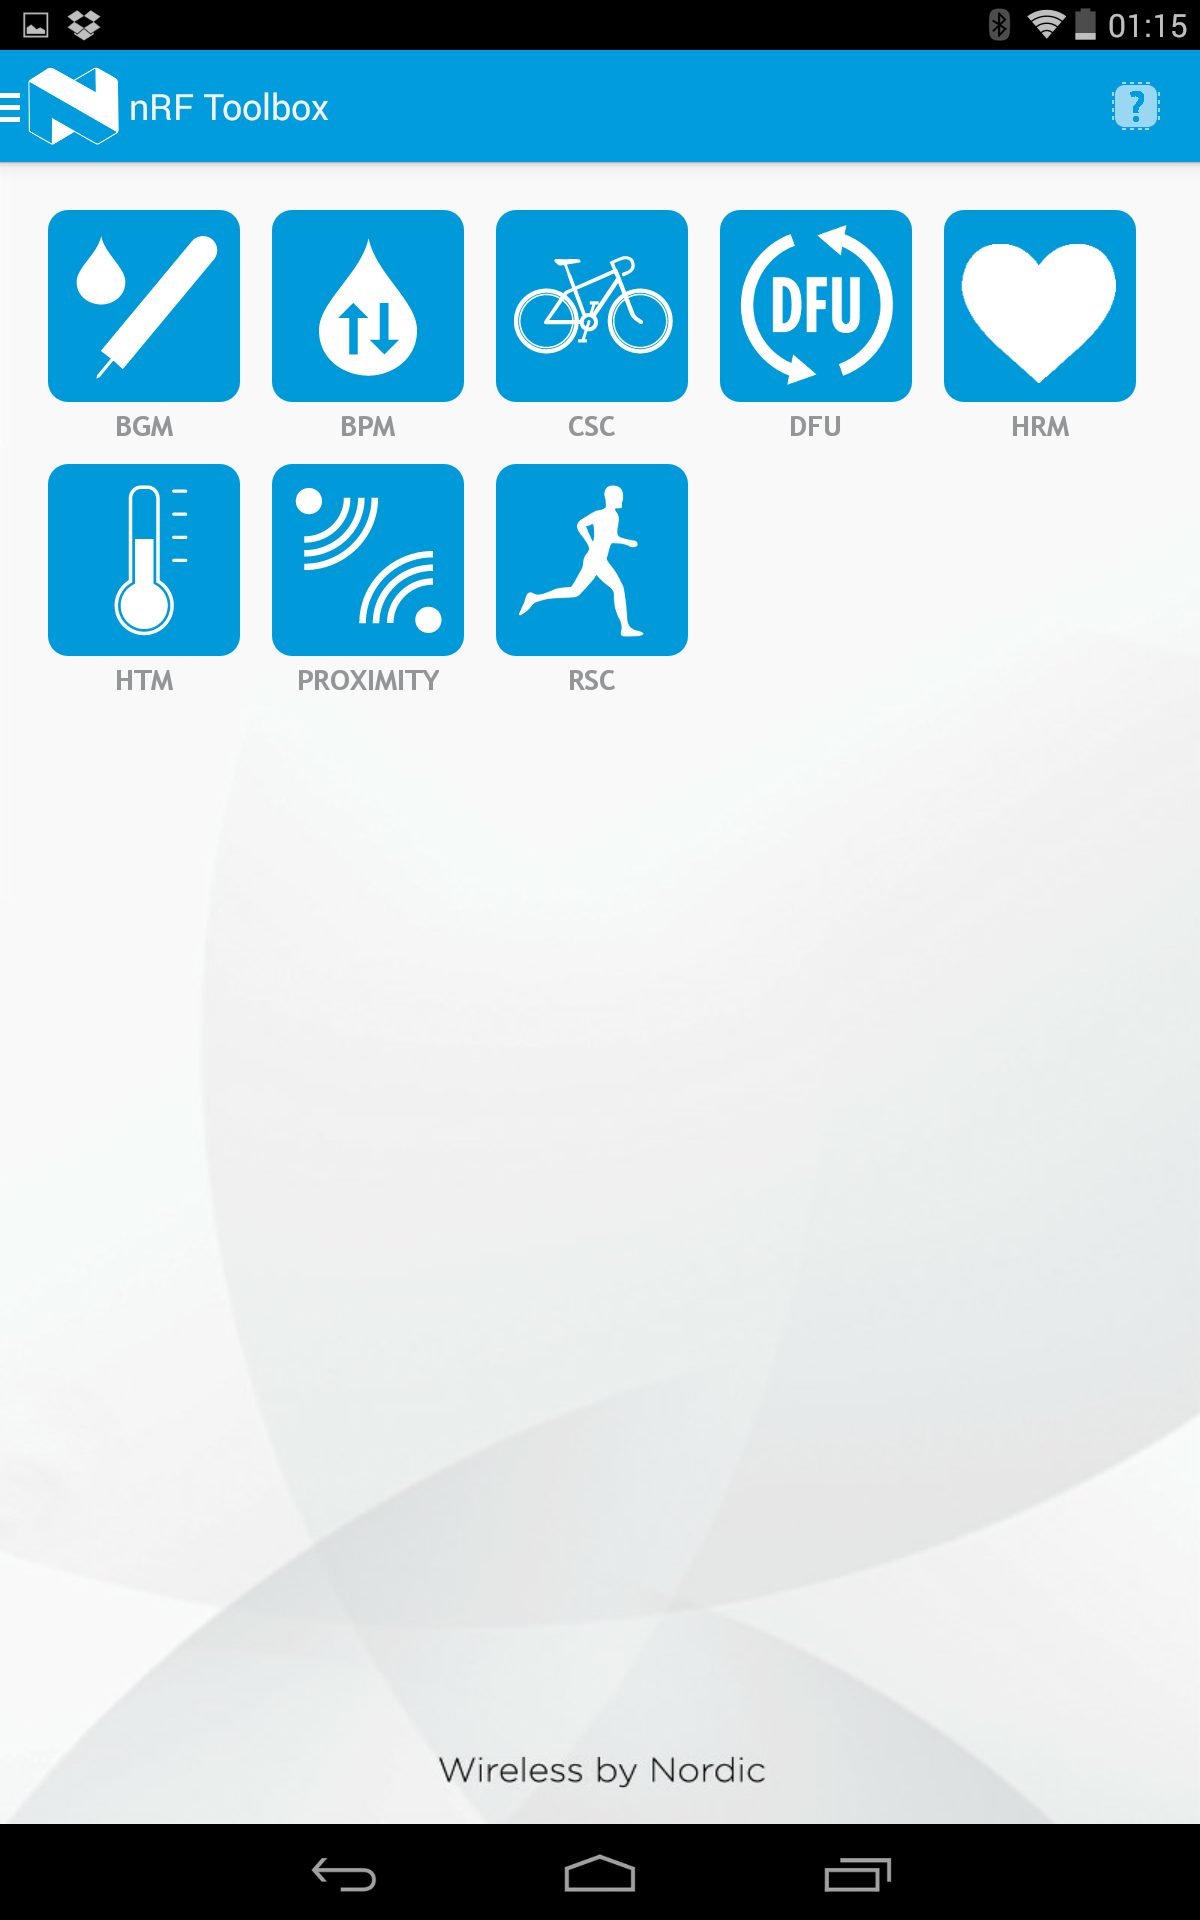 adafruit_products_Screenshot_2014-09-25-01-15-28.png